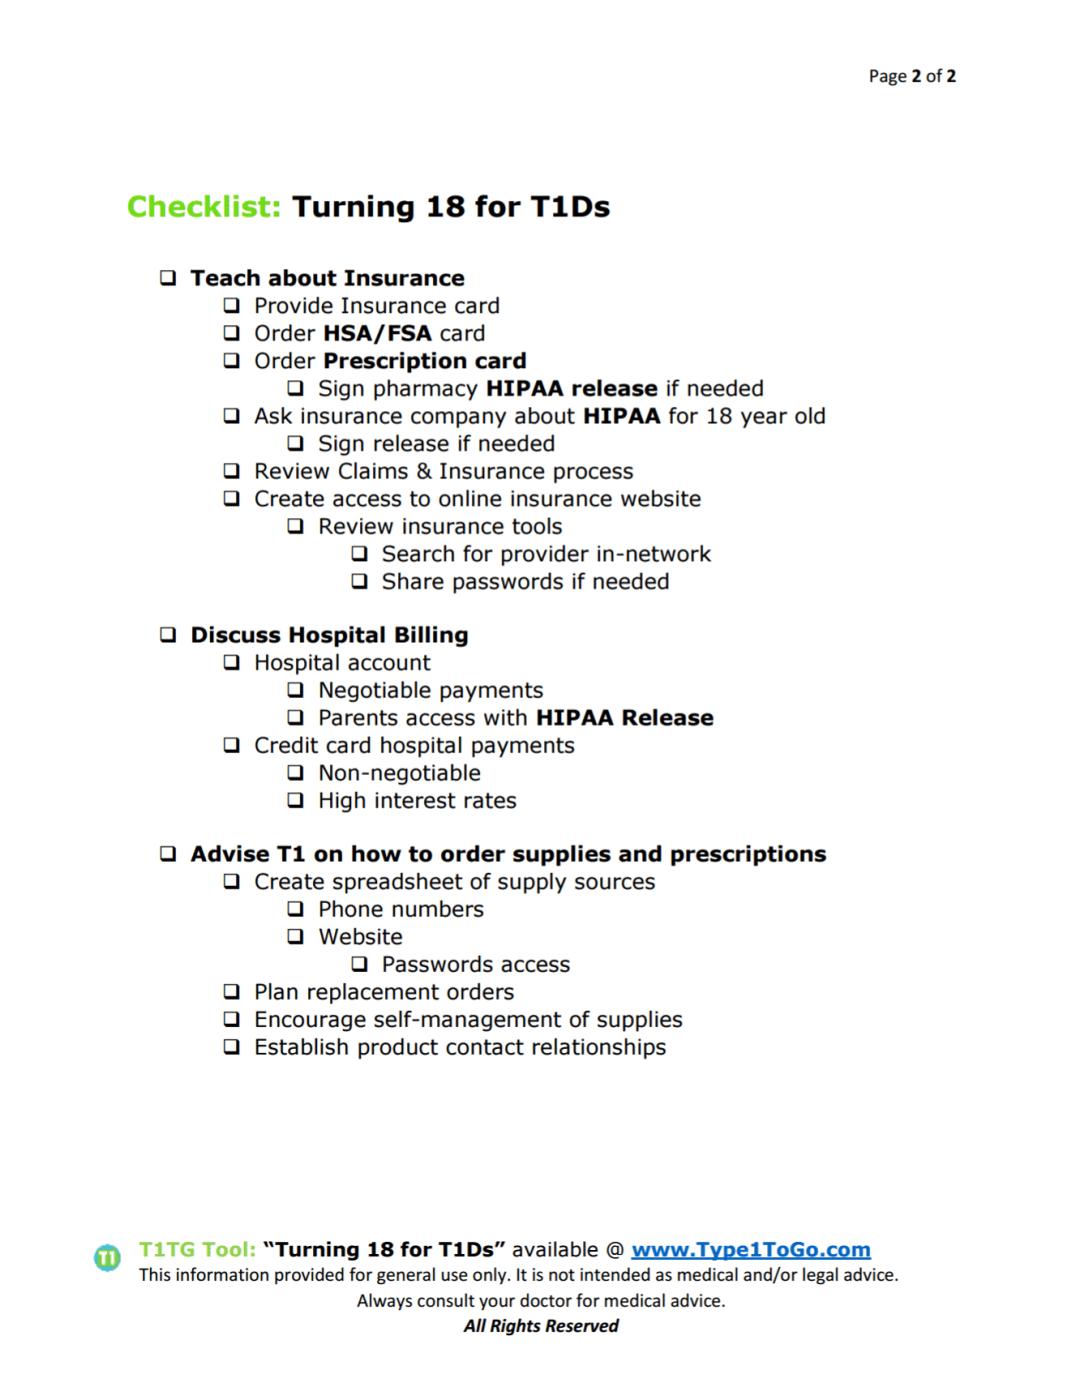 Turning 18 Checklist for Type 1 Diabetics